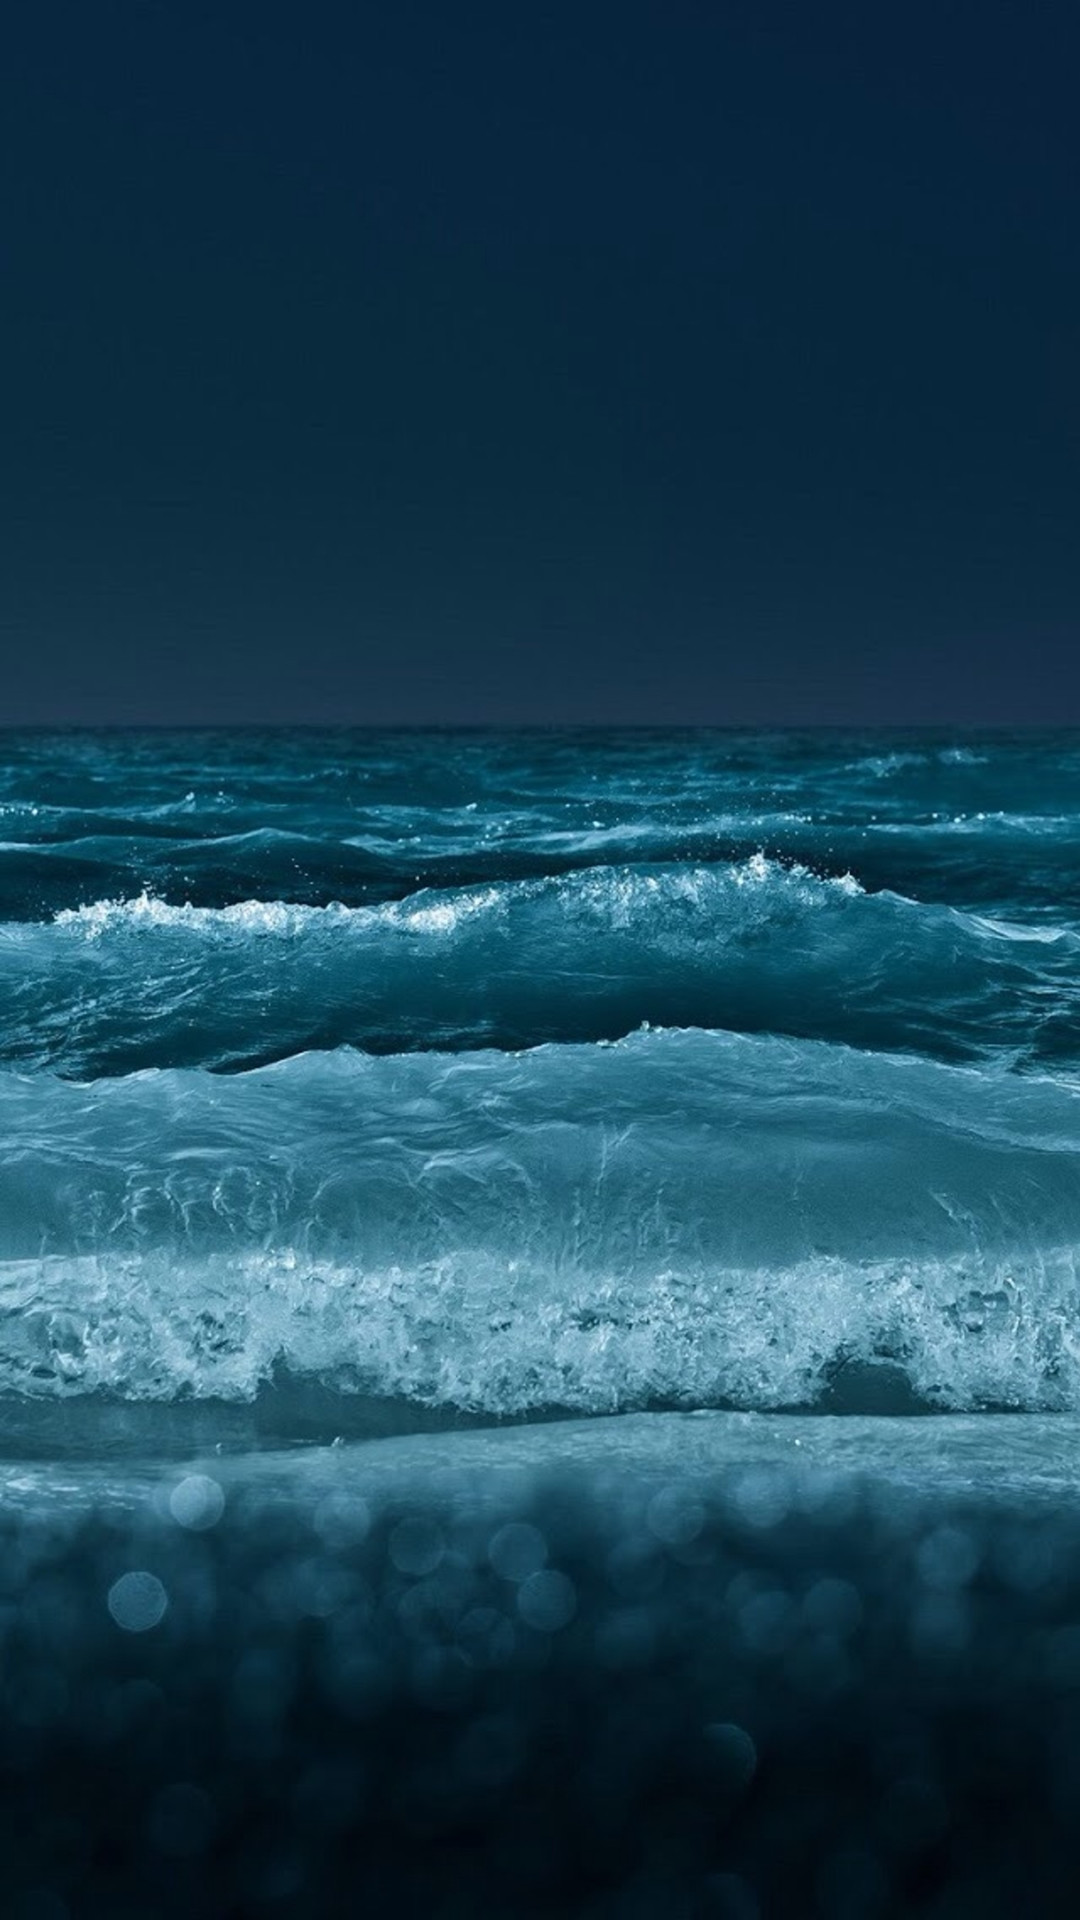 Night Ocean Wallpaper 65 Images